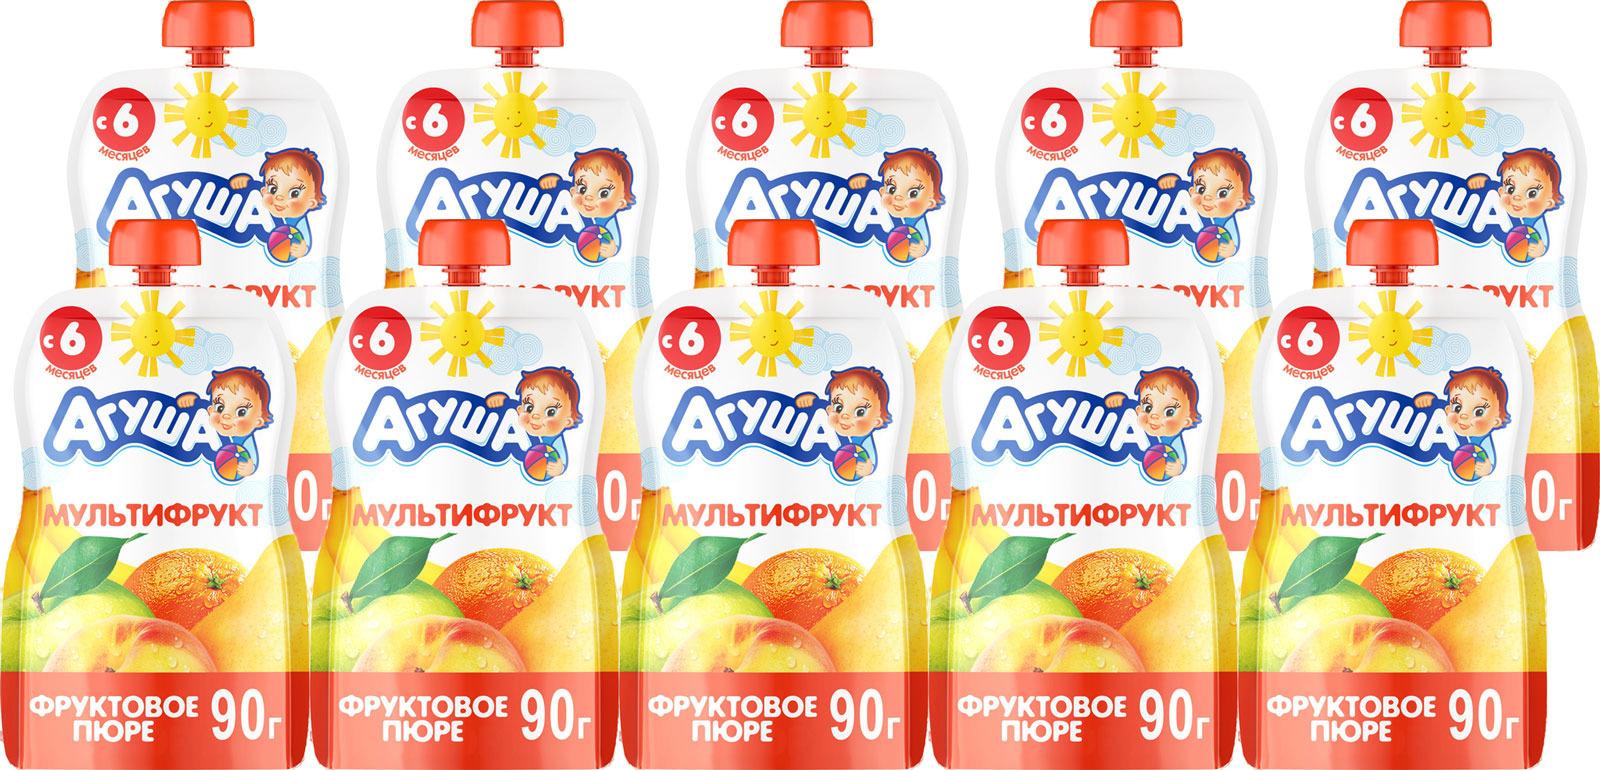 Пюре фруктовое с 6 месяцев Агуша Мультифрукт, 10 шт по 90 г